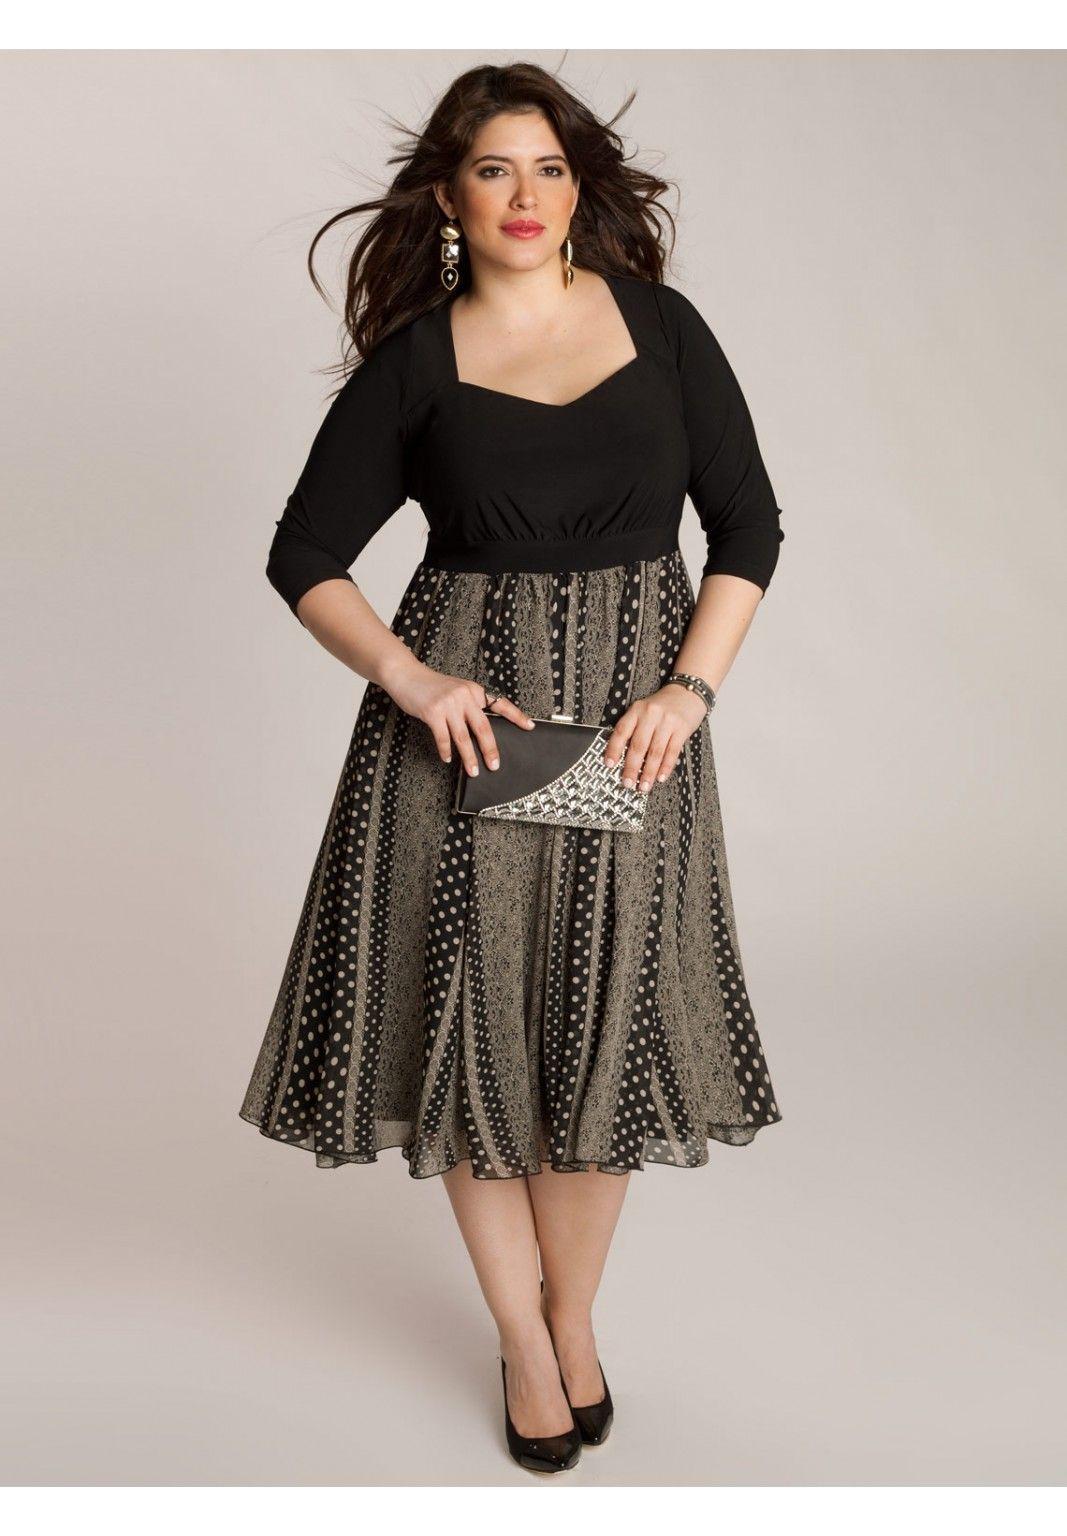 plus size sarah dress image shopping pinterest. Black Bedroom Furniture Sets. Home Design Ideas